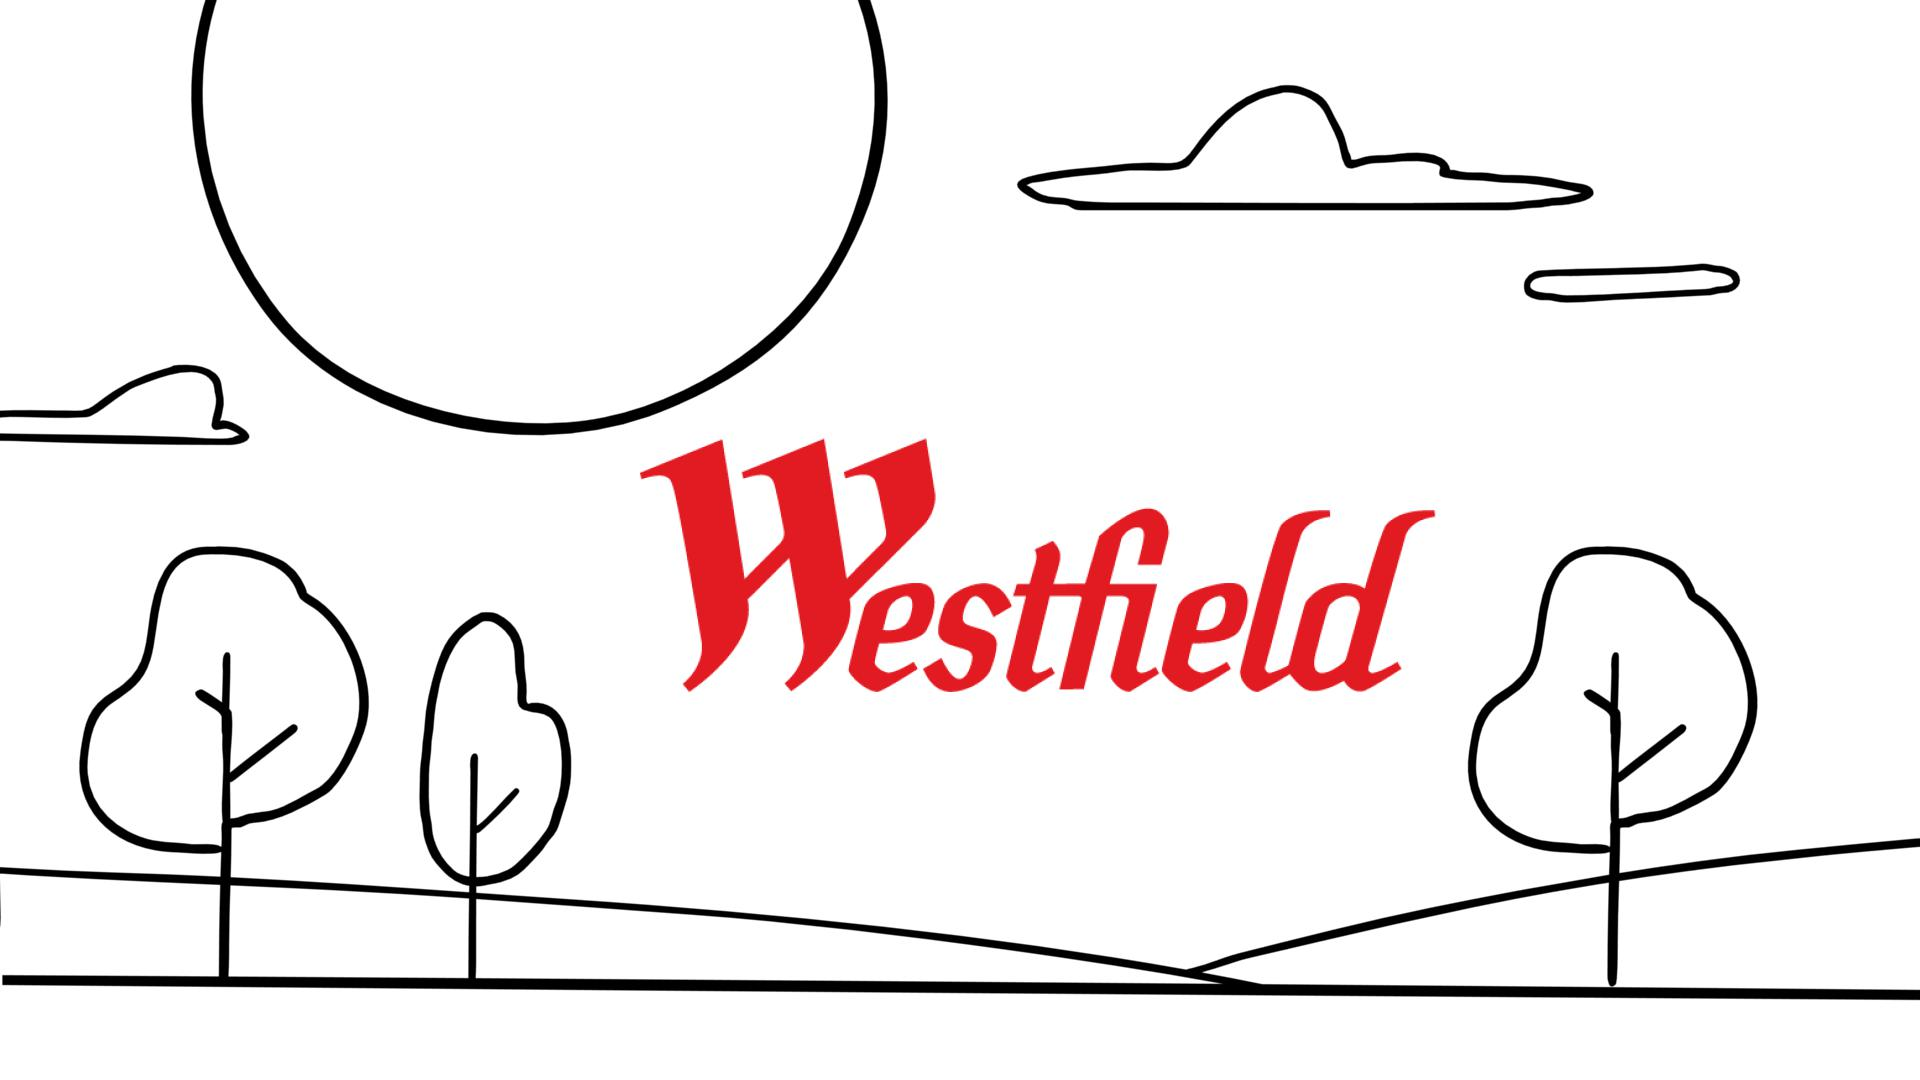 Westfield-1-20.jpg